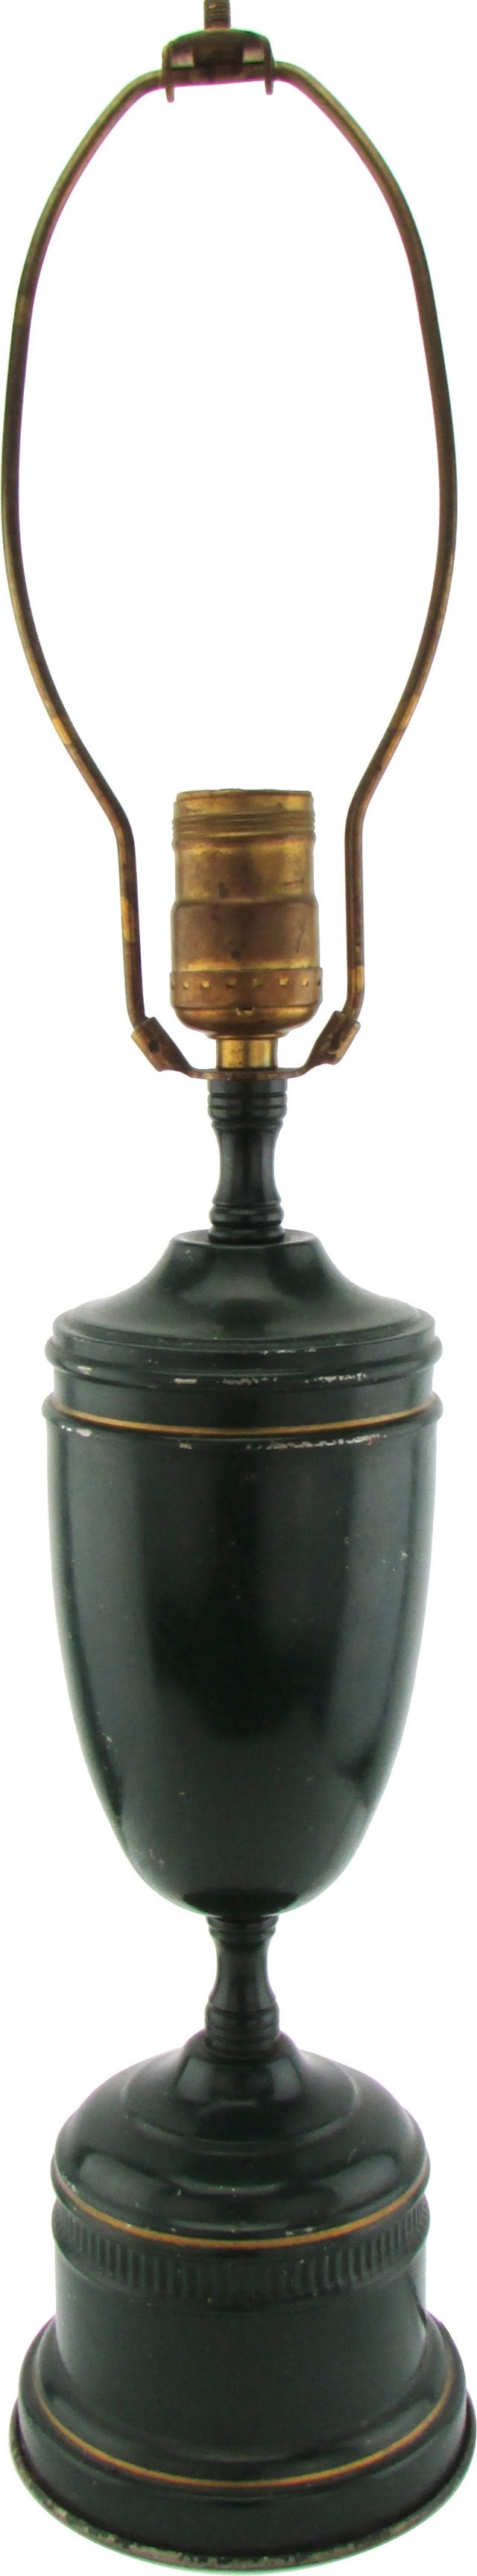 Green Tole Lamp